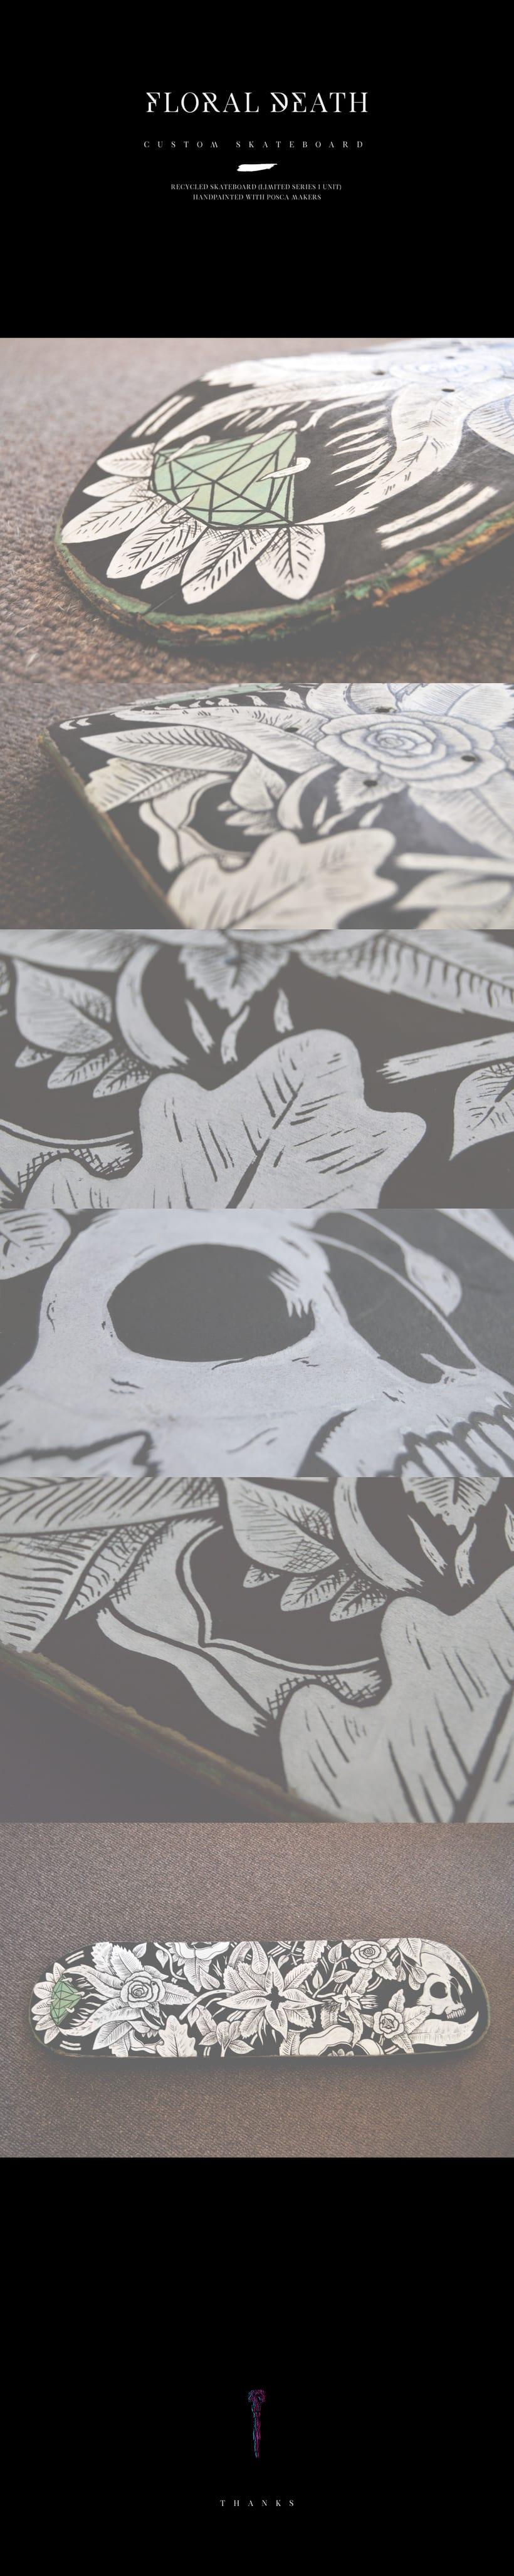 Floral Death · Custom Skateboard -1